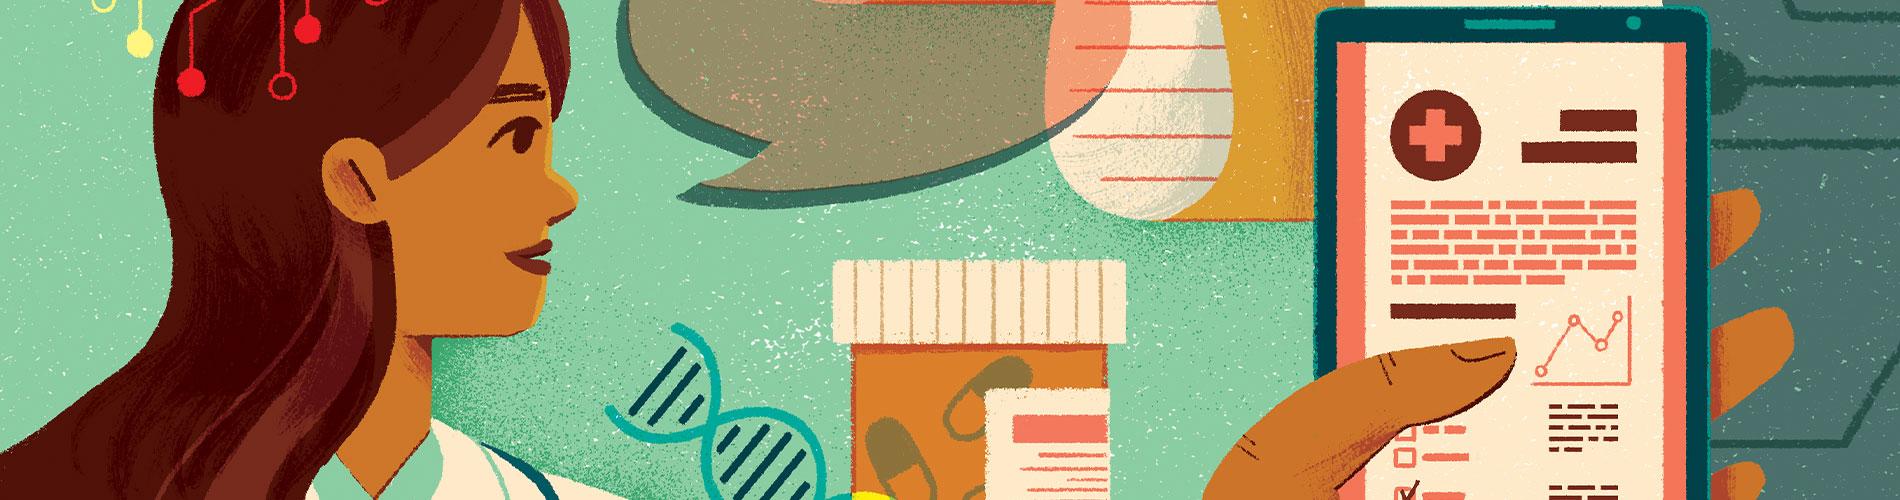 UAB - Medicine Magazine - New Doors to Learning